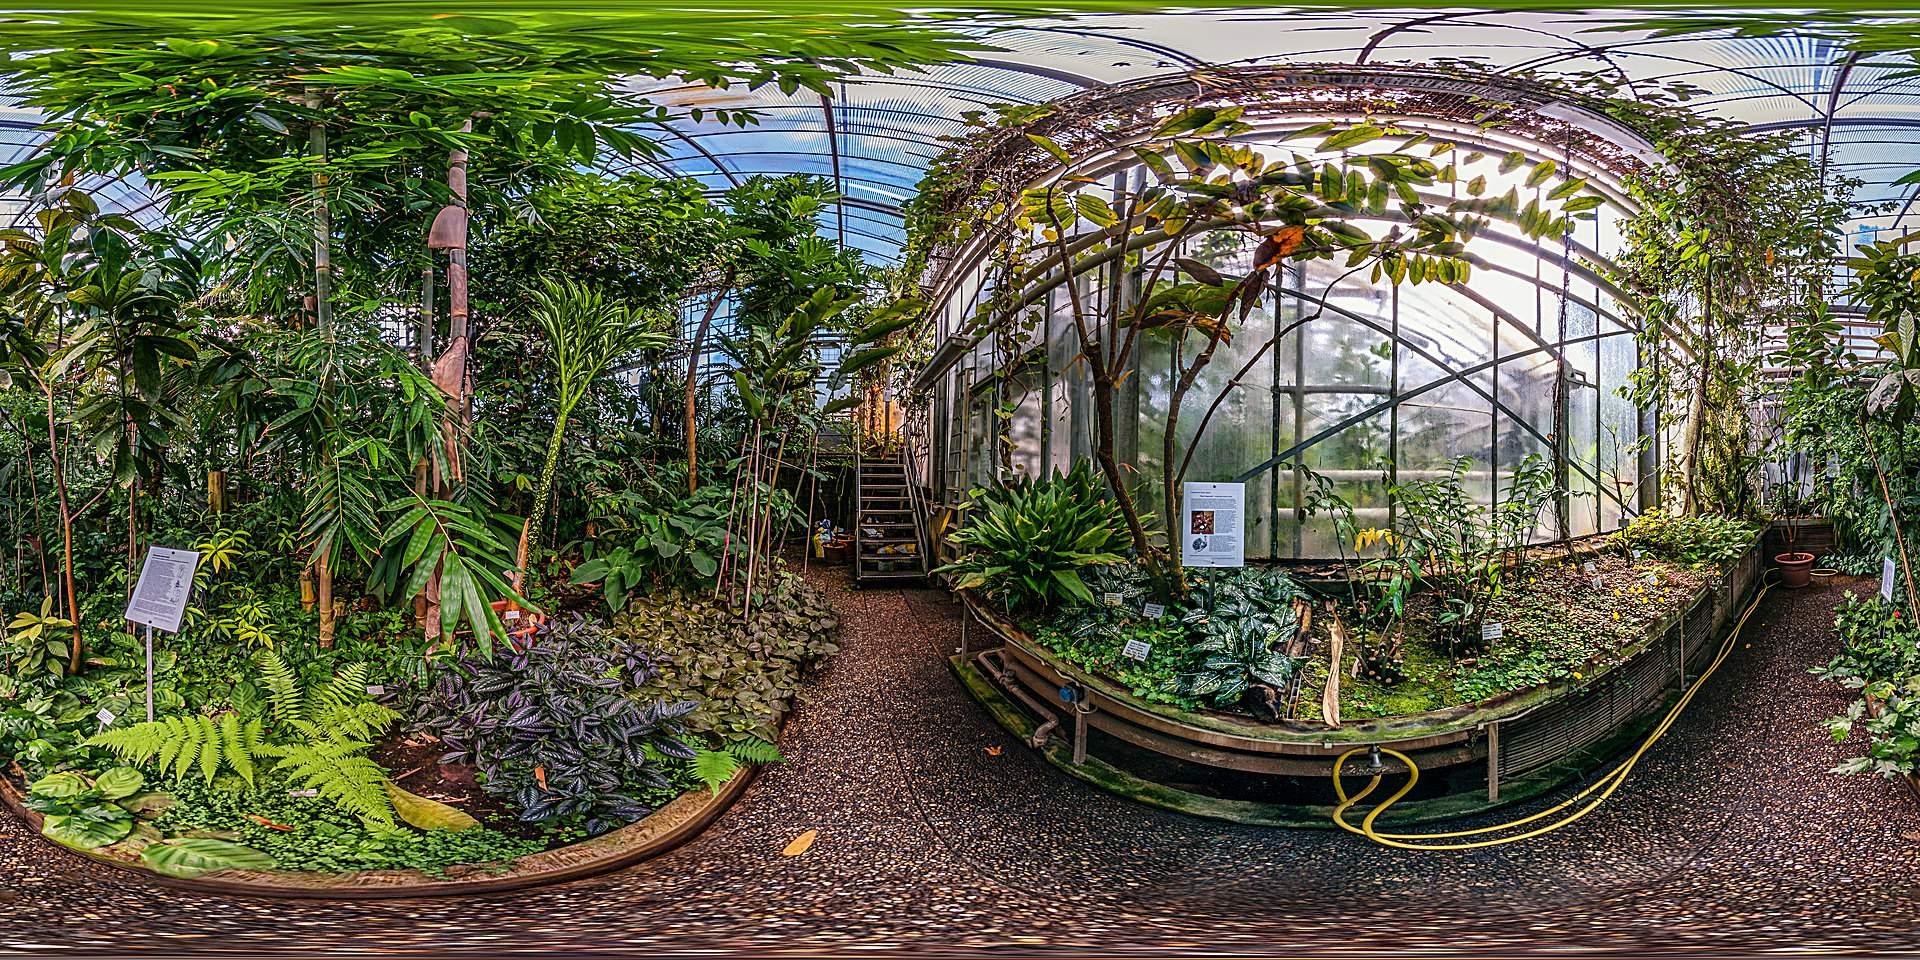 Botanischer Garten Darmstadt Tropenhaus